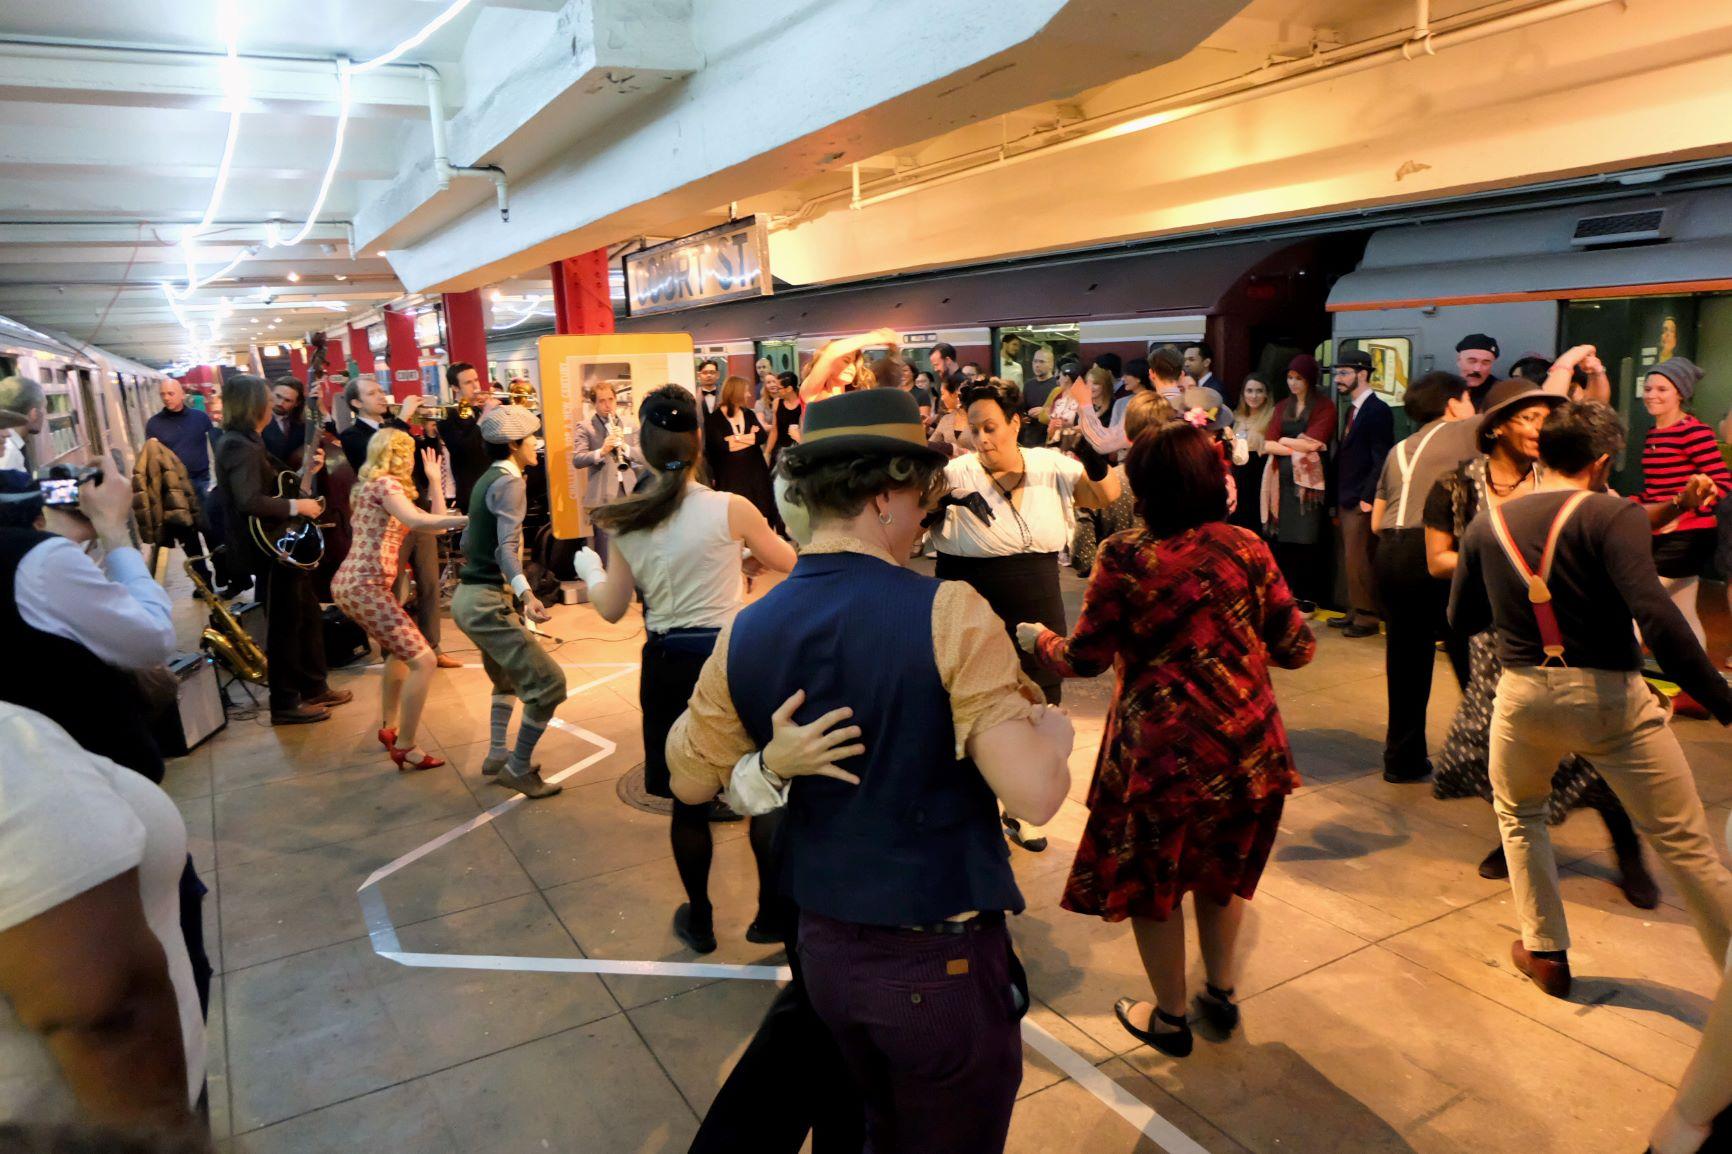 subway swing, holiday, events, transit museum, nyc subways